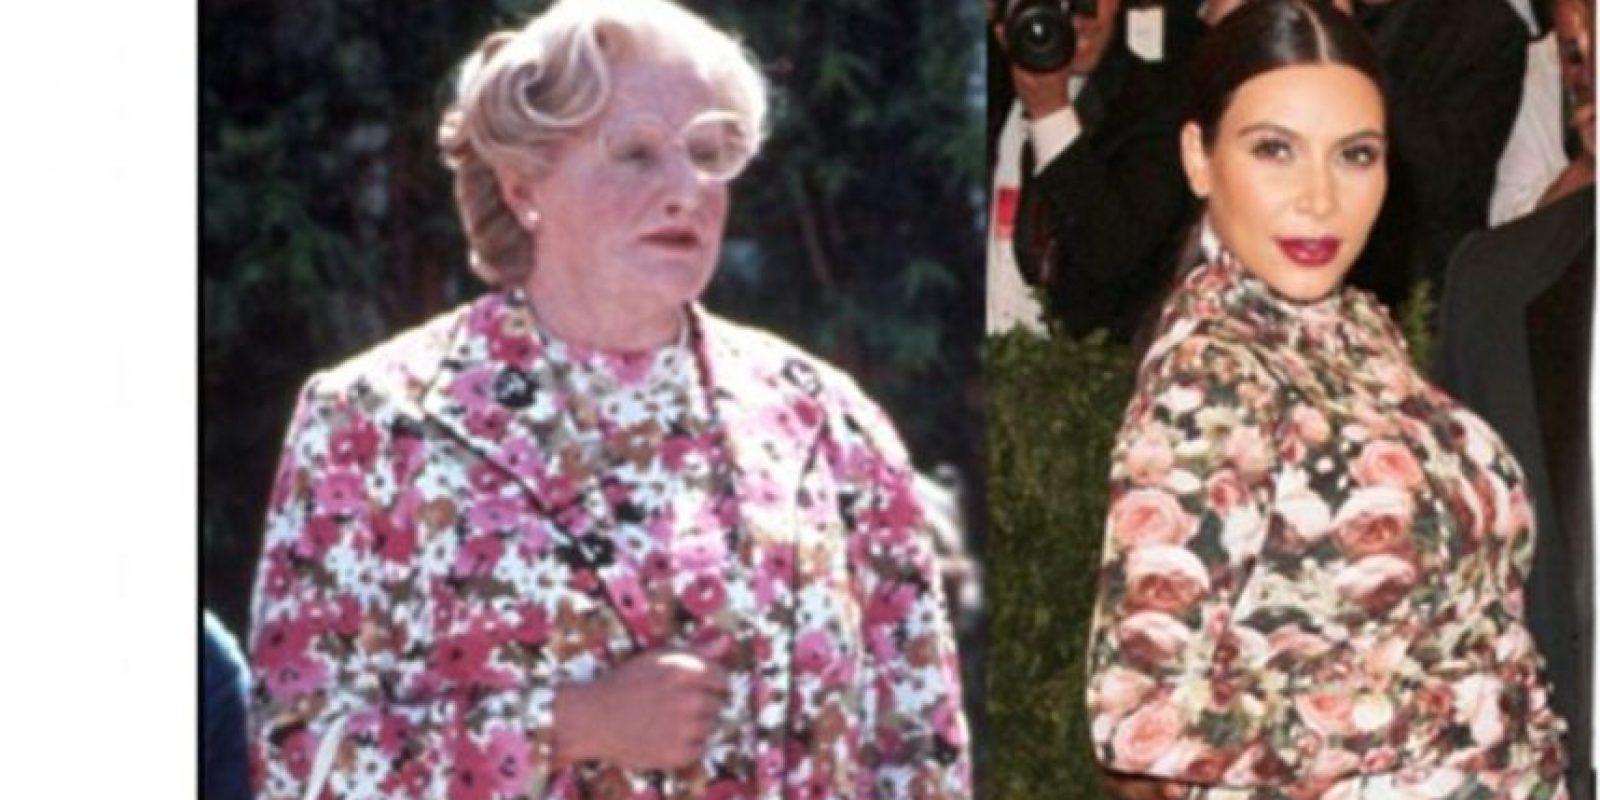 Incluso el difunto Robin Williams se burló de ella. Foto:Twitter